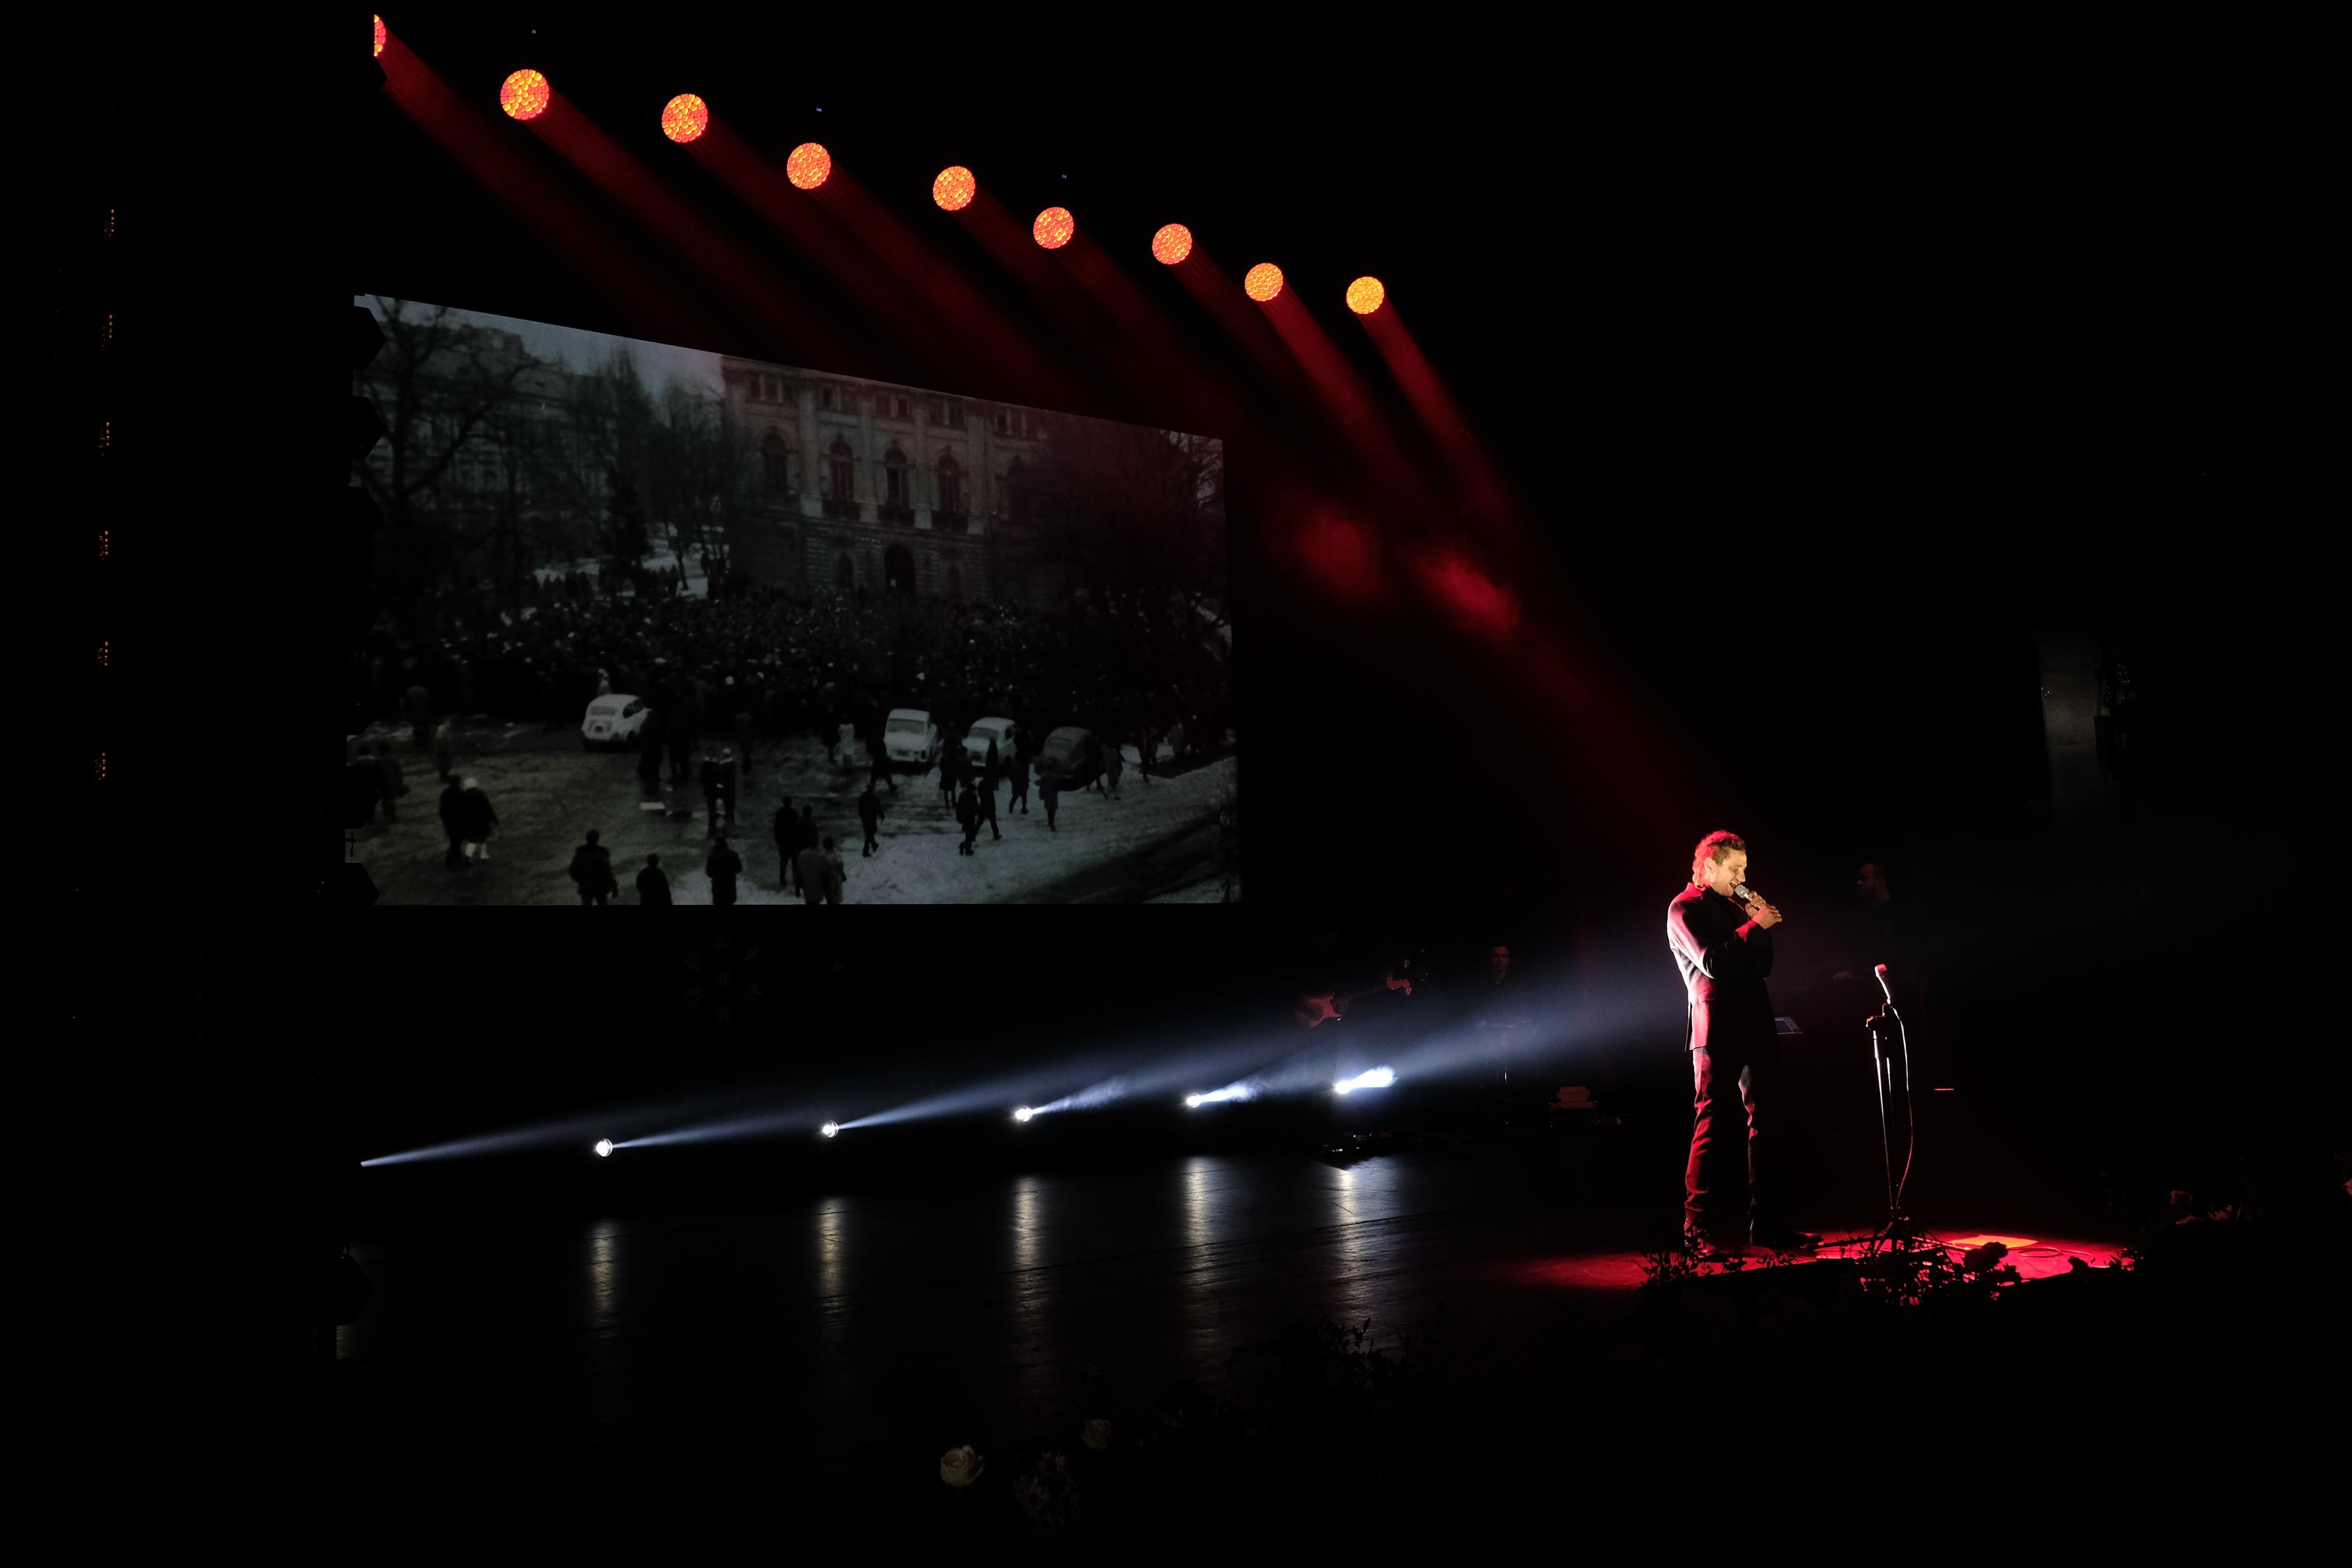 Gala BohaterONy 2019 - 16.10 - koncert Janusza Radka